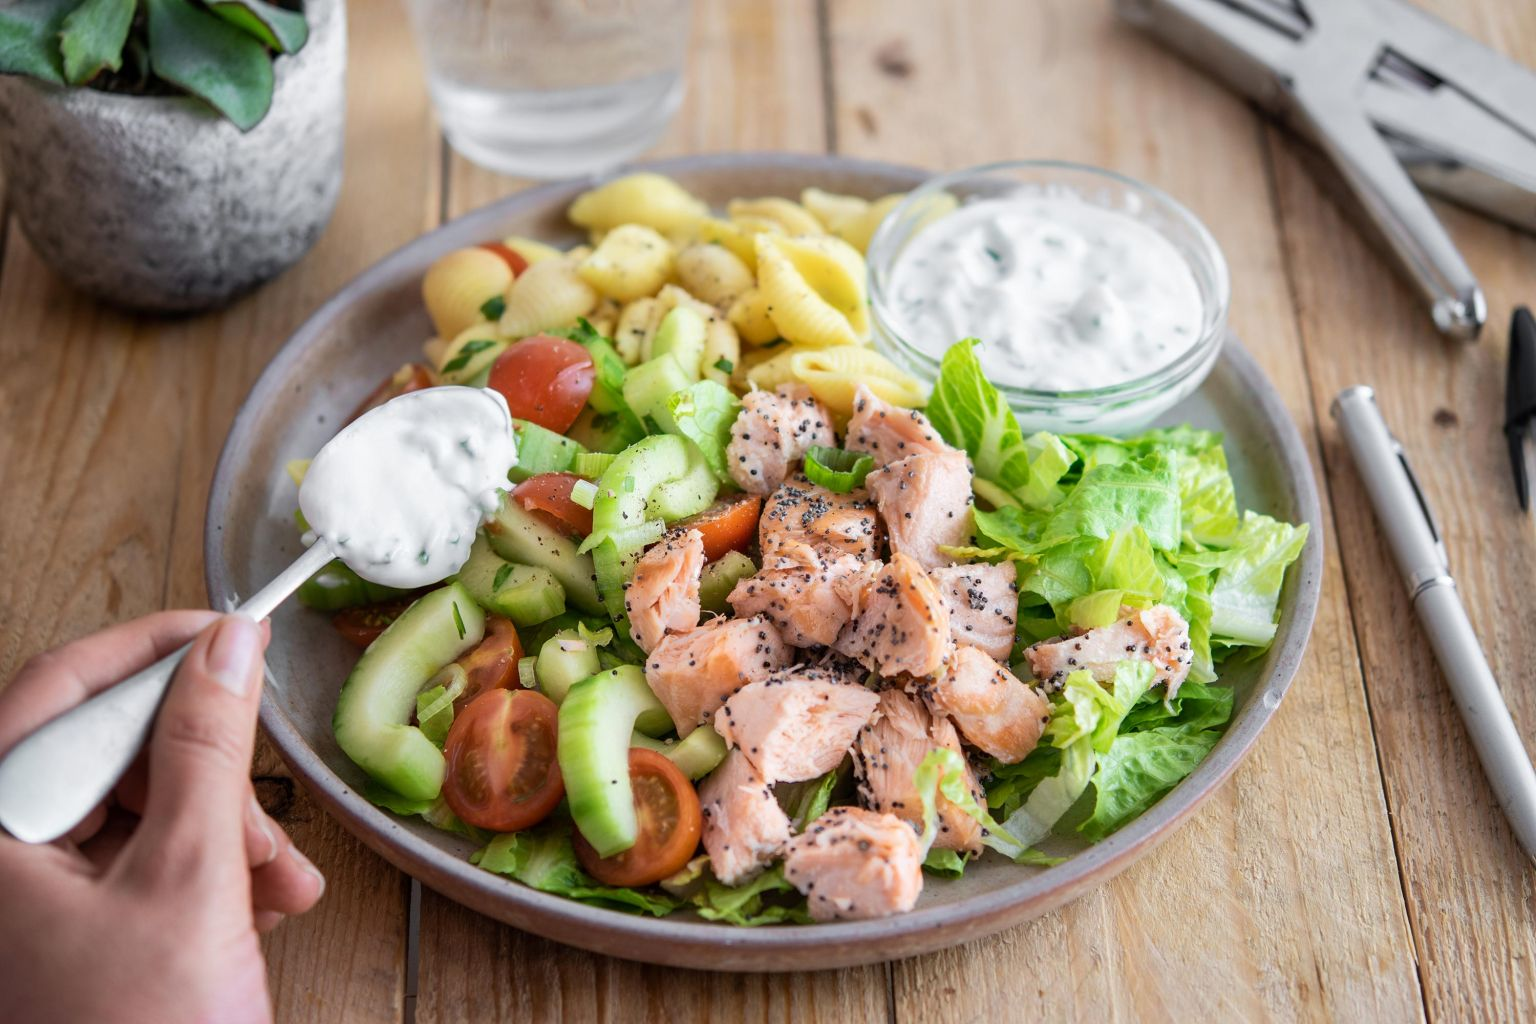 Salade romaine, saumon au pavot, pâtes conchiglie, tomates cerise